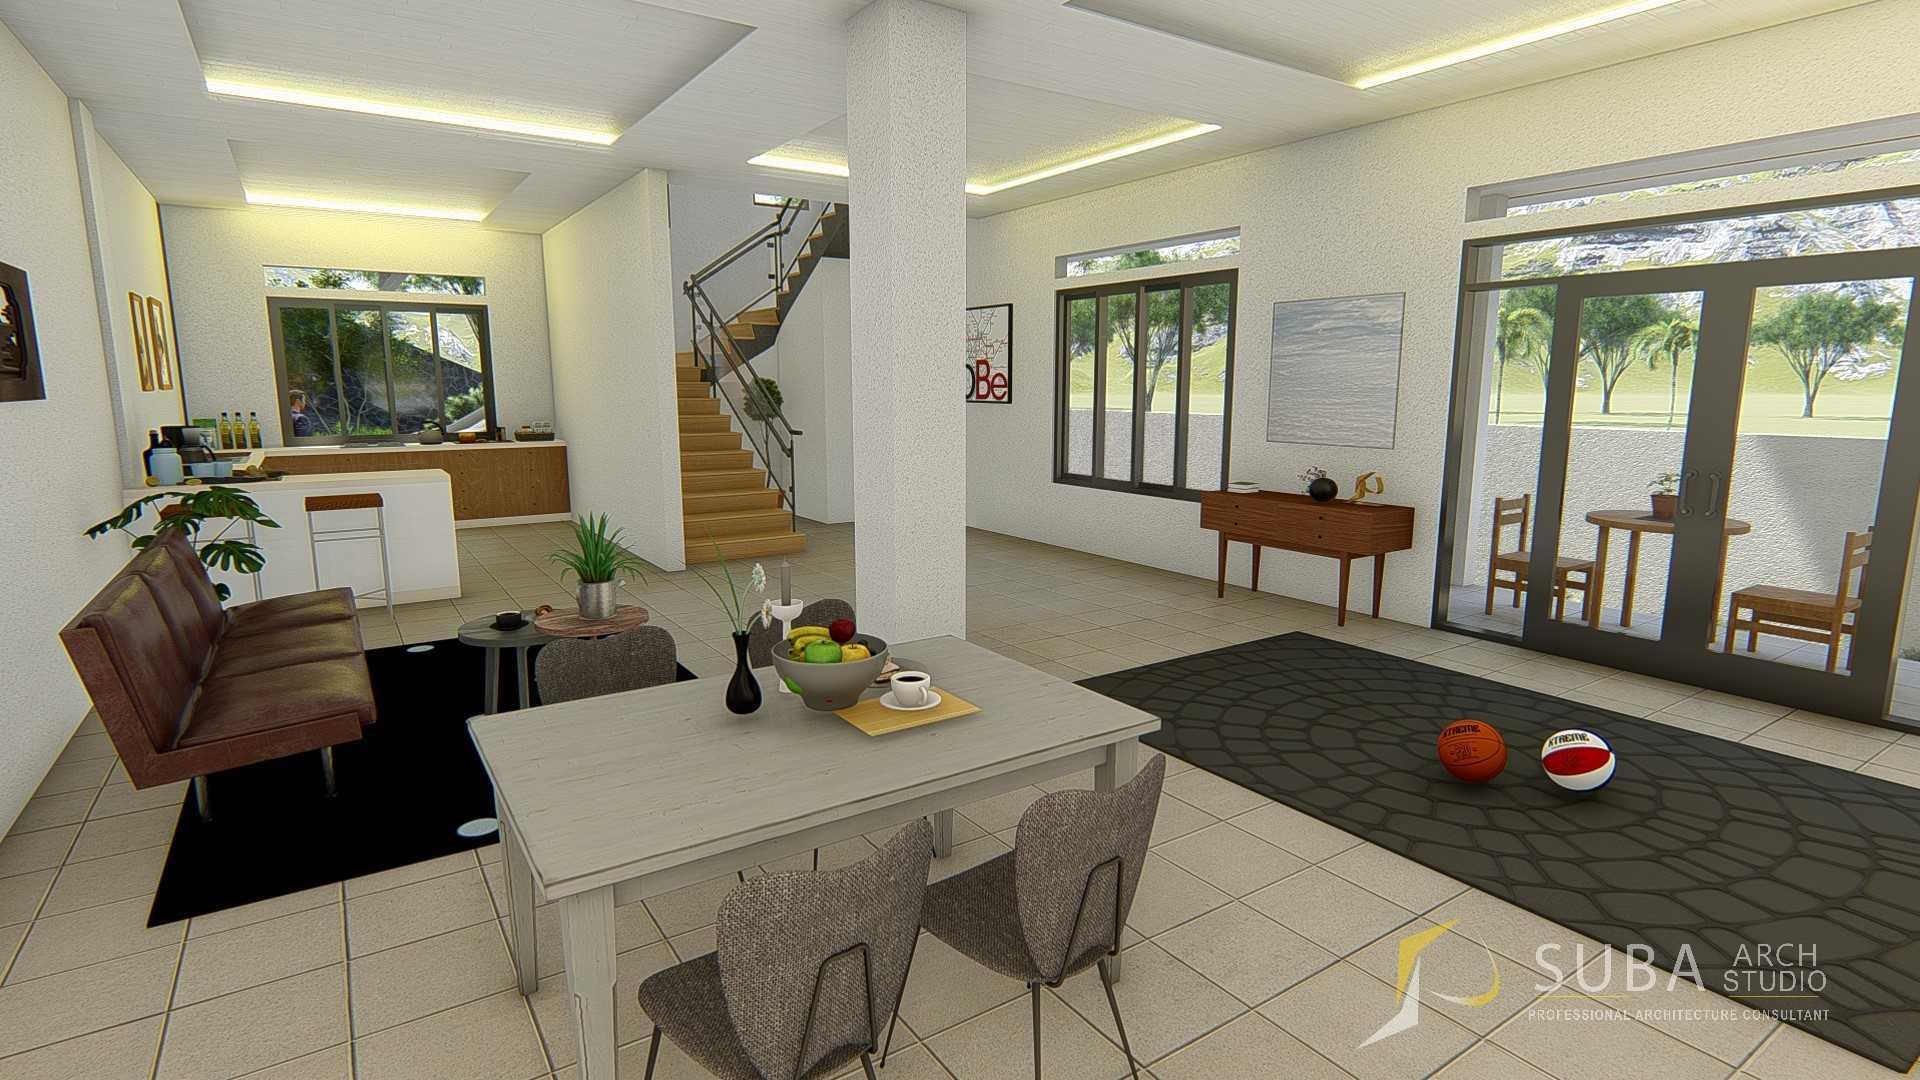 Suba-Arch Desain Rencana Rumah Tinggal 2Lt 13 X 17 @bu Wita Padang, Kota Padang, Sumatera Barat, Indonesia Padang, Kota Padang, Sumatera Barat, Indonesia Suba-Arch-Desain-Rencana-Rumah-Tinggal-2Lt-13-X-17-Bu-Wita   86845